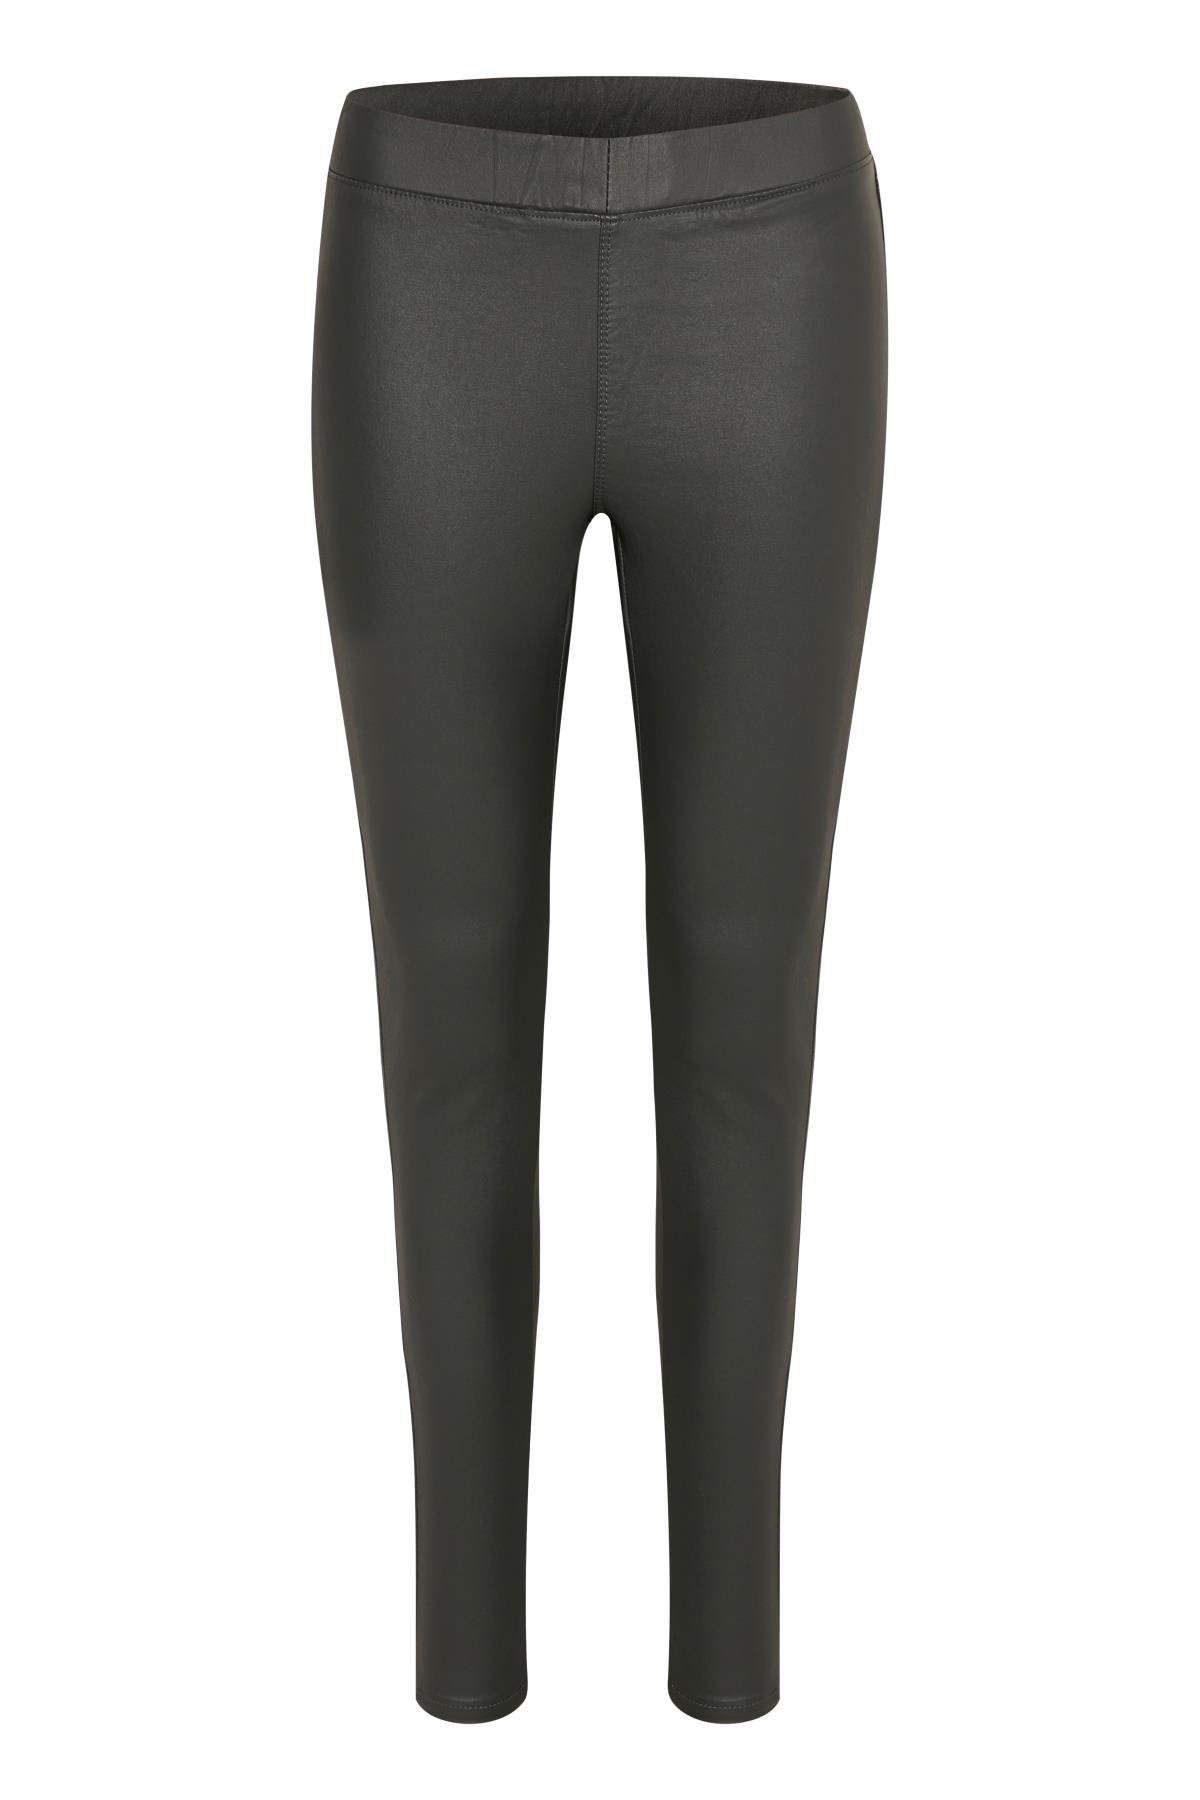 Mørkegrå Casual bukser fra Kaffe – Køb Mørkegrå Casual bukser fra str. 34-46 her